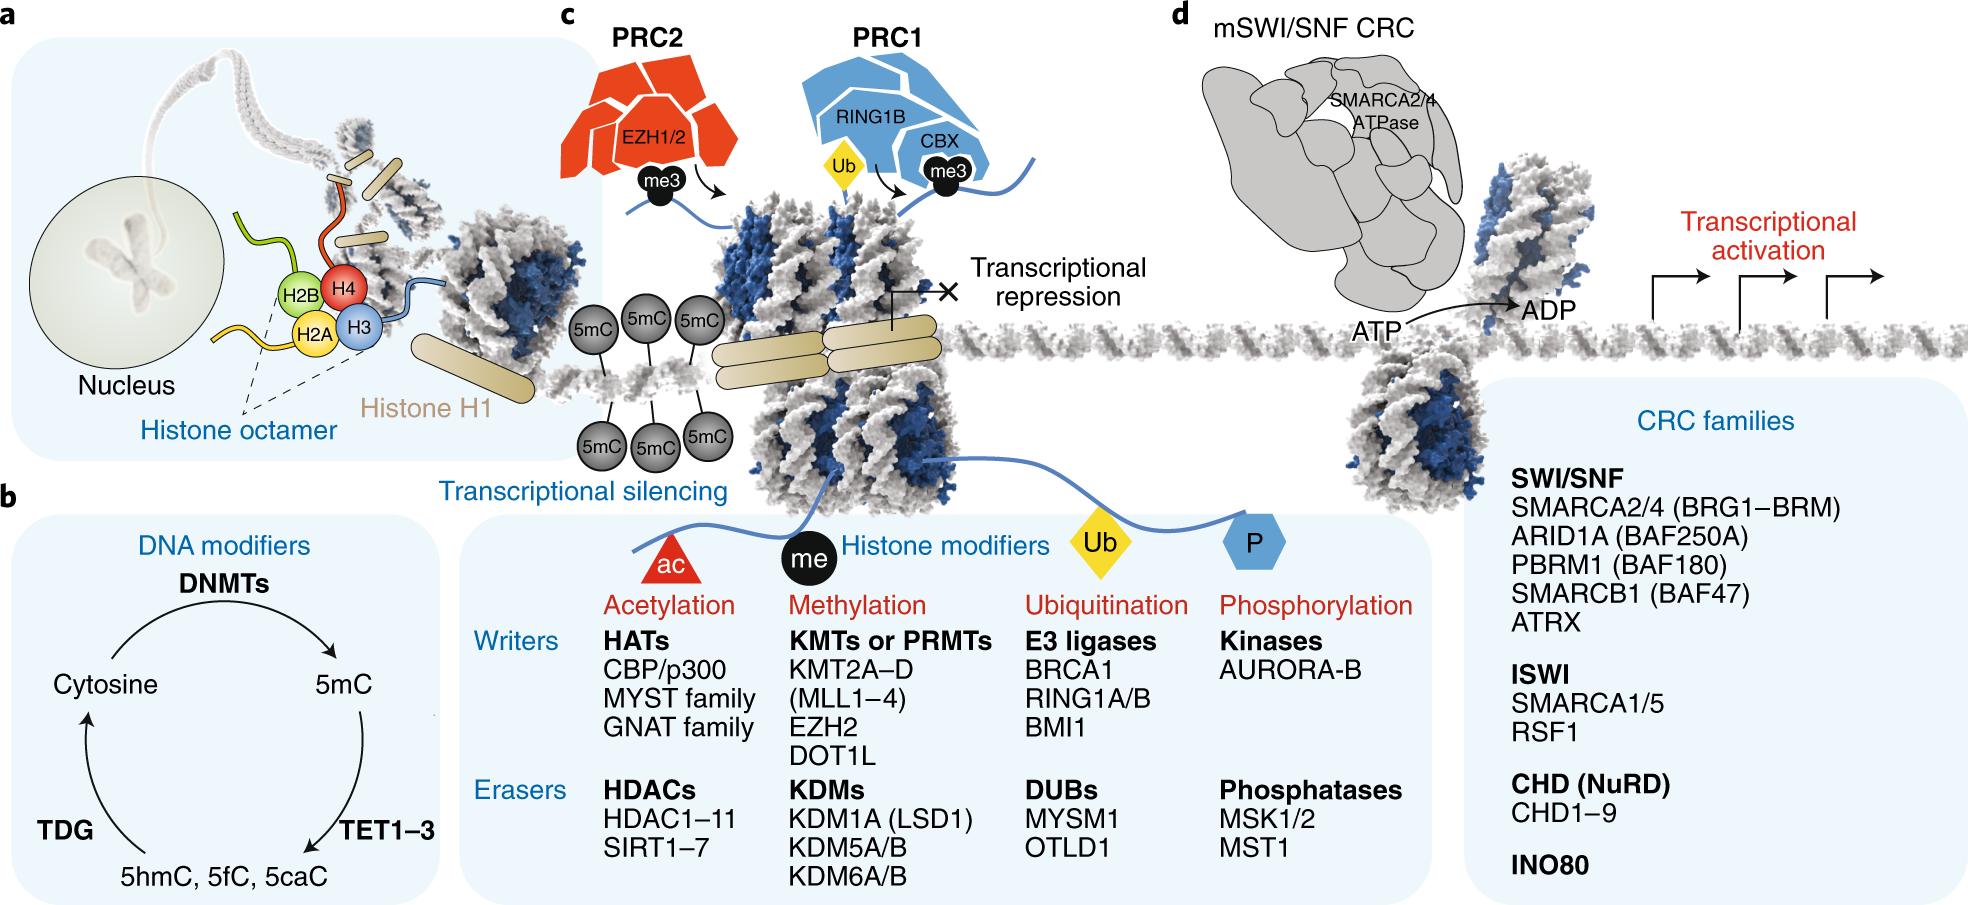 Chromatin regulatory mechanisms and therapeutic